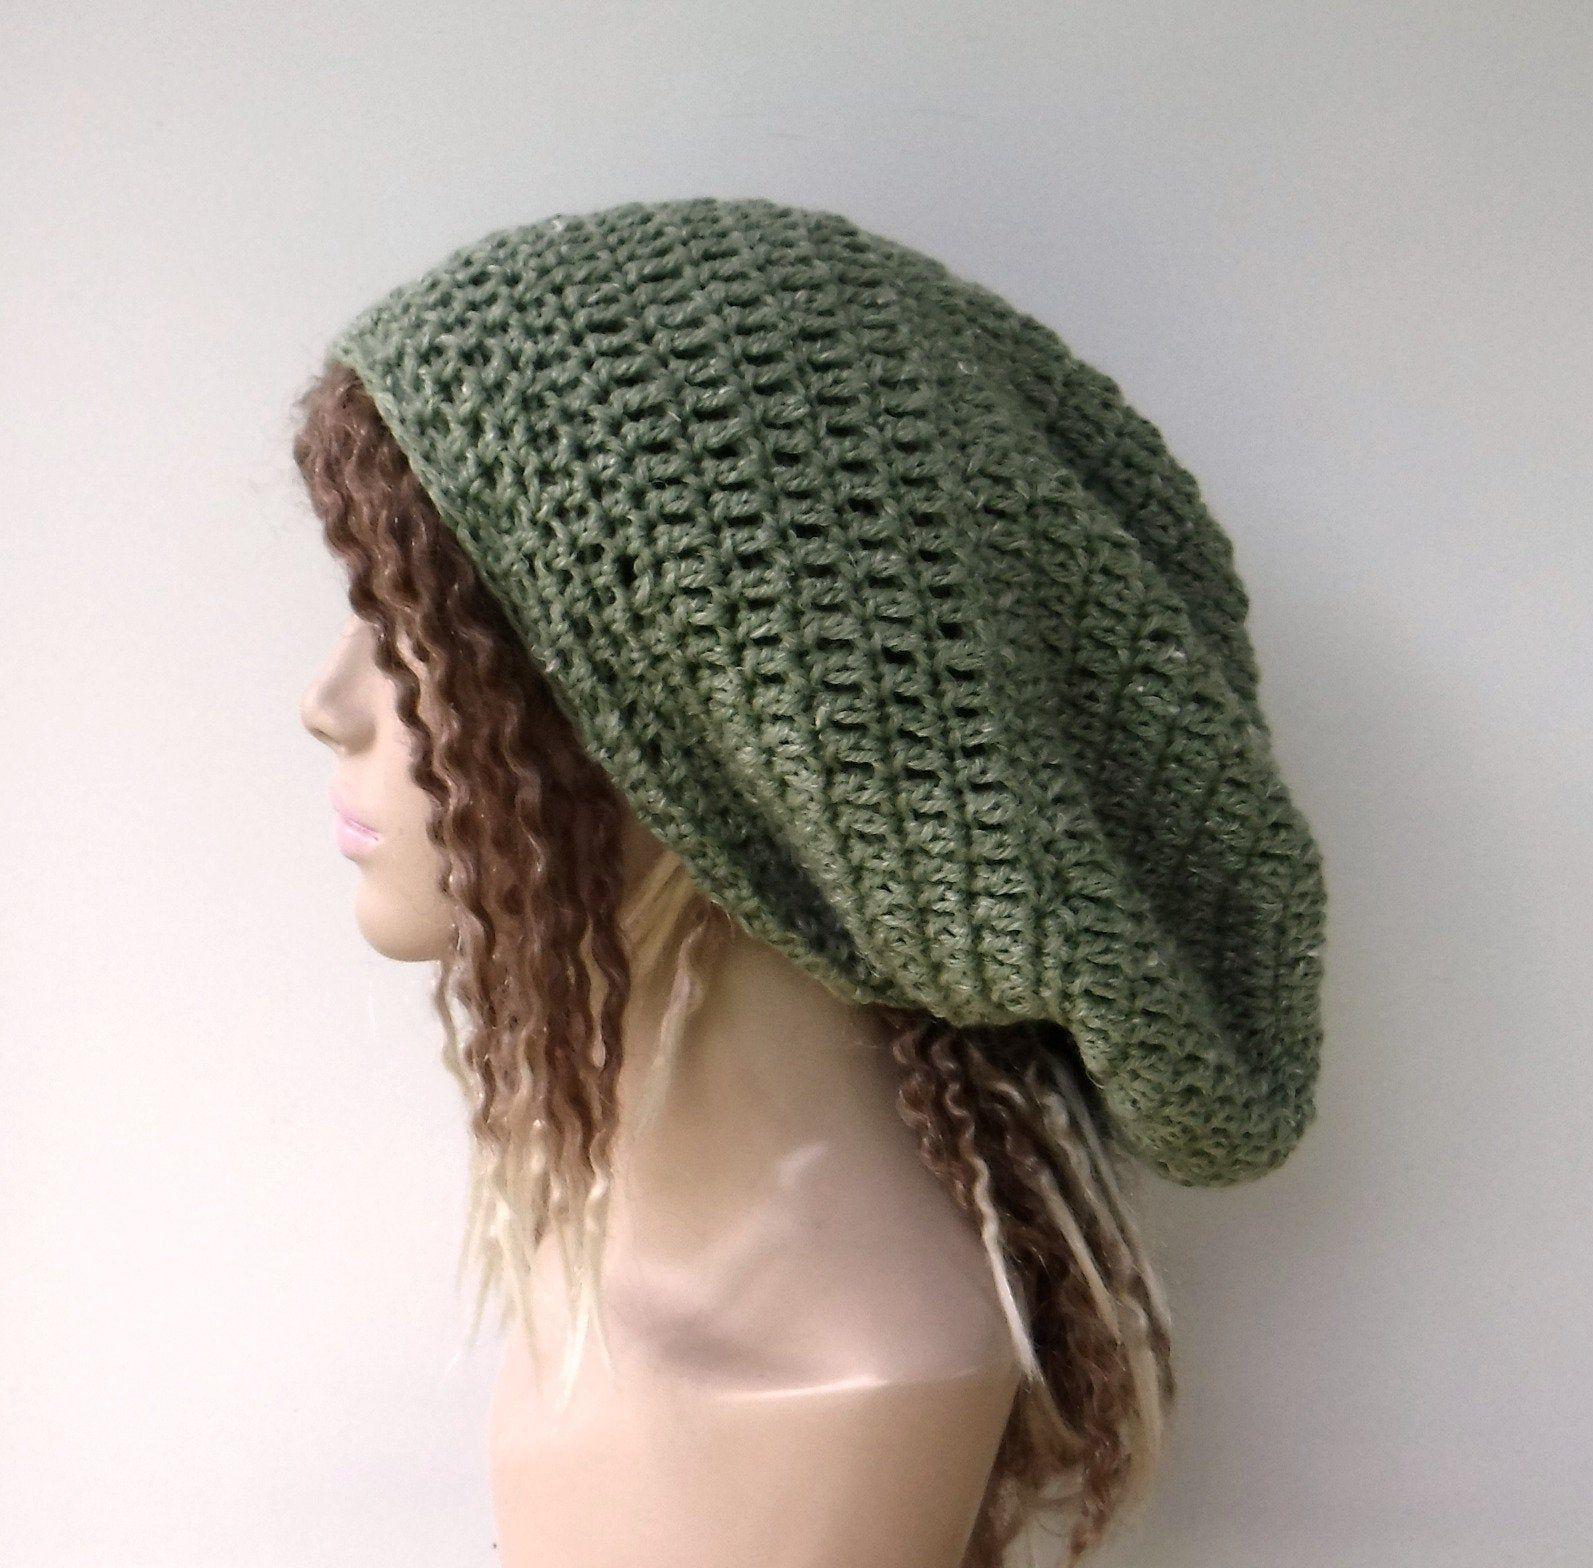 ee45369a2 Slouchy beanie sage green hippie hat dreadlocks tam hat dread tam ...